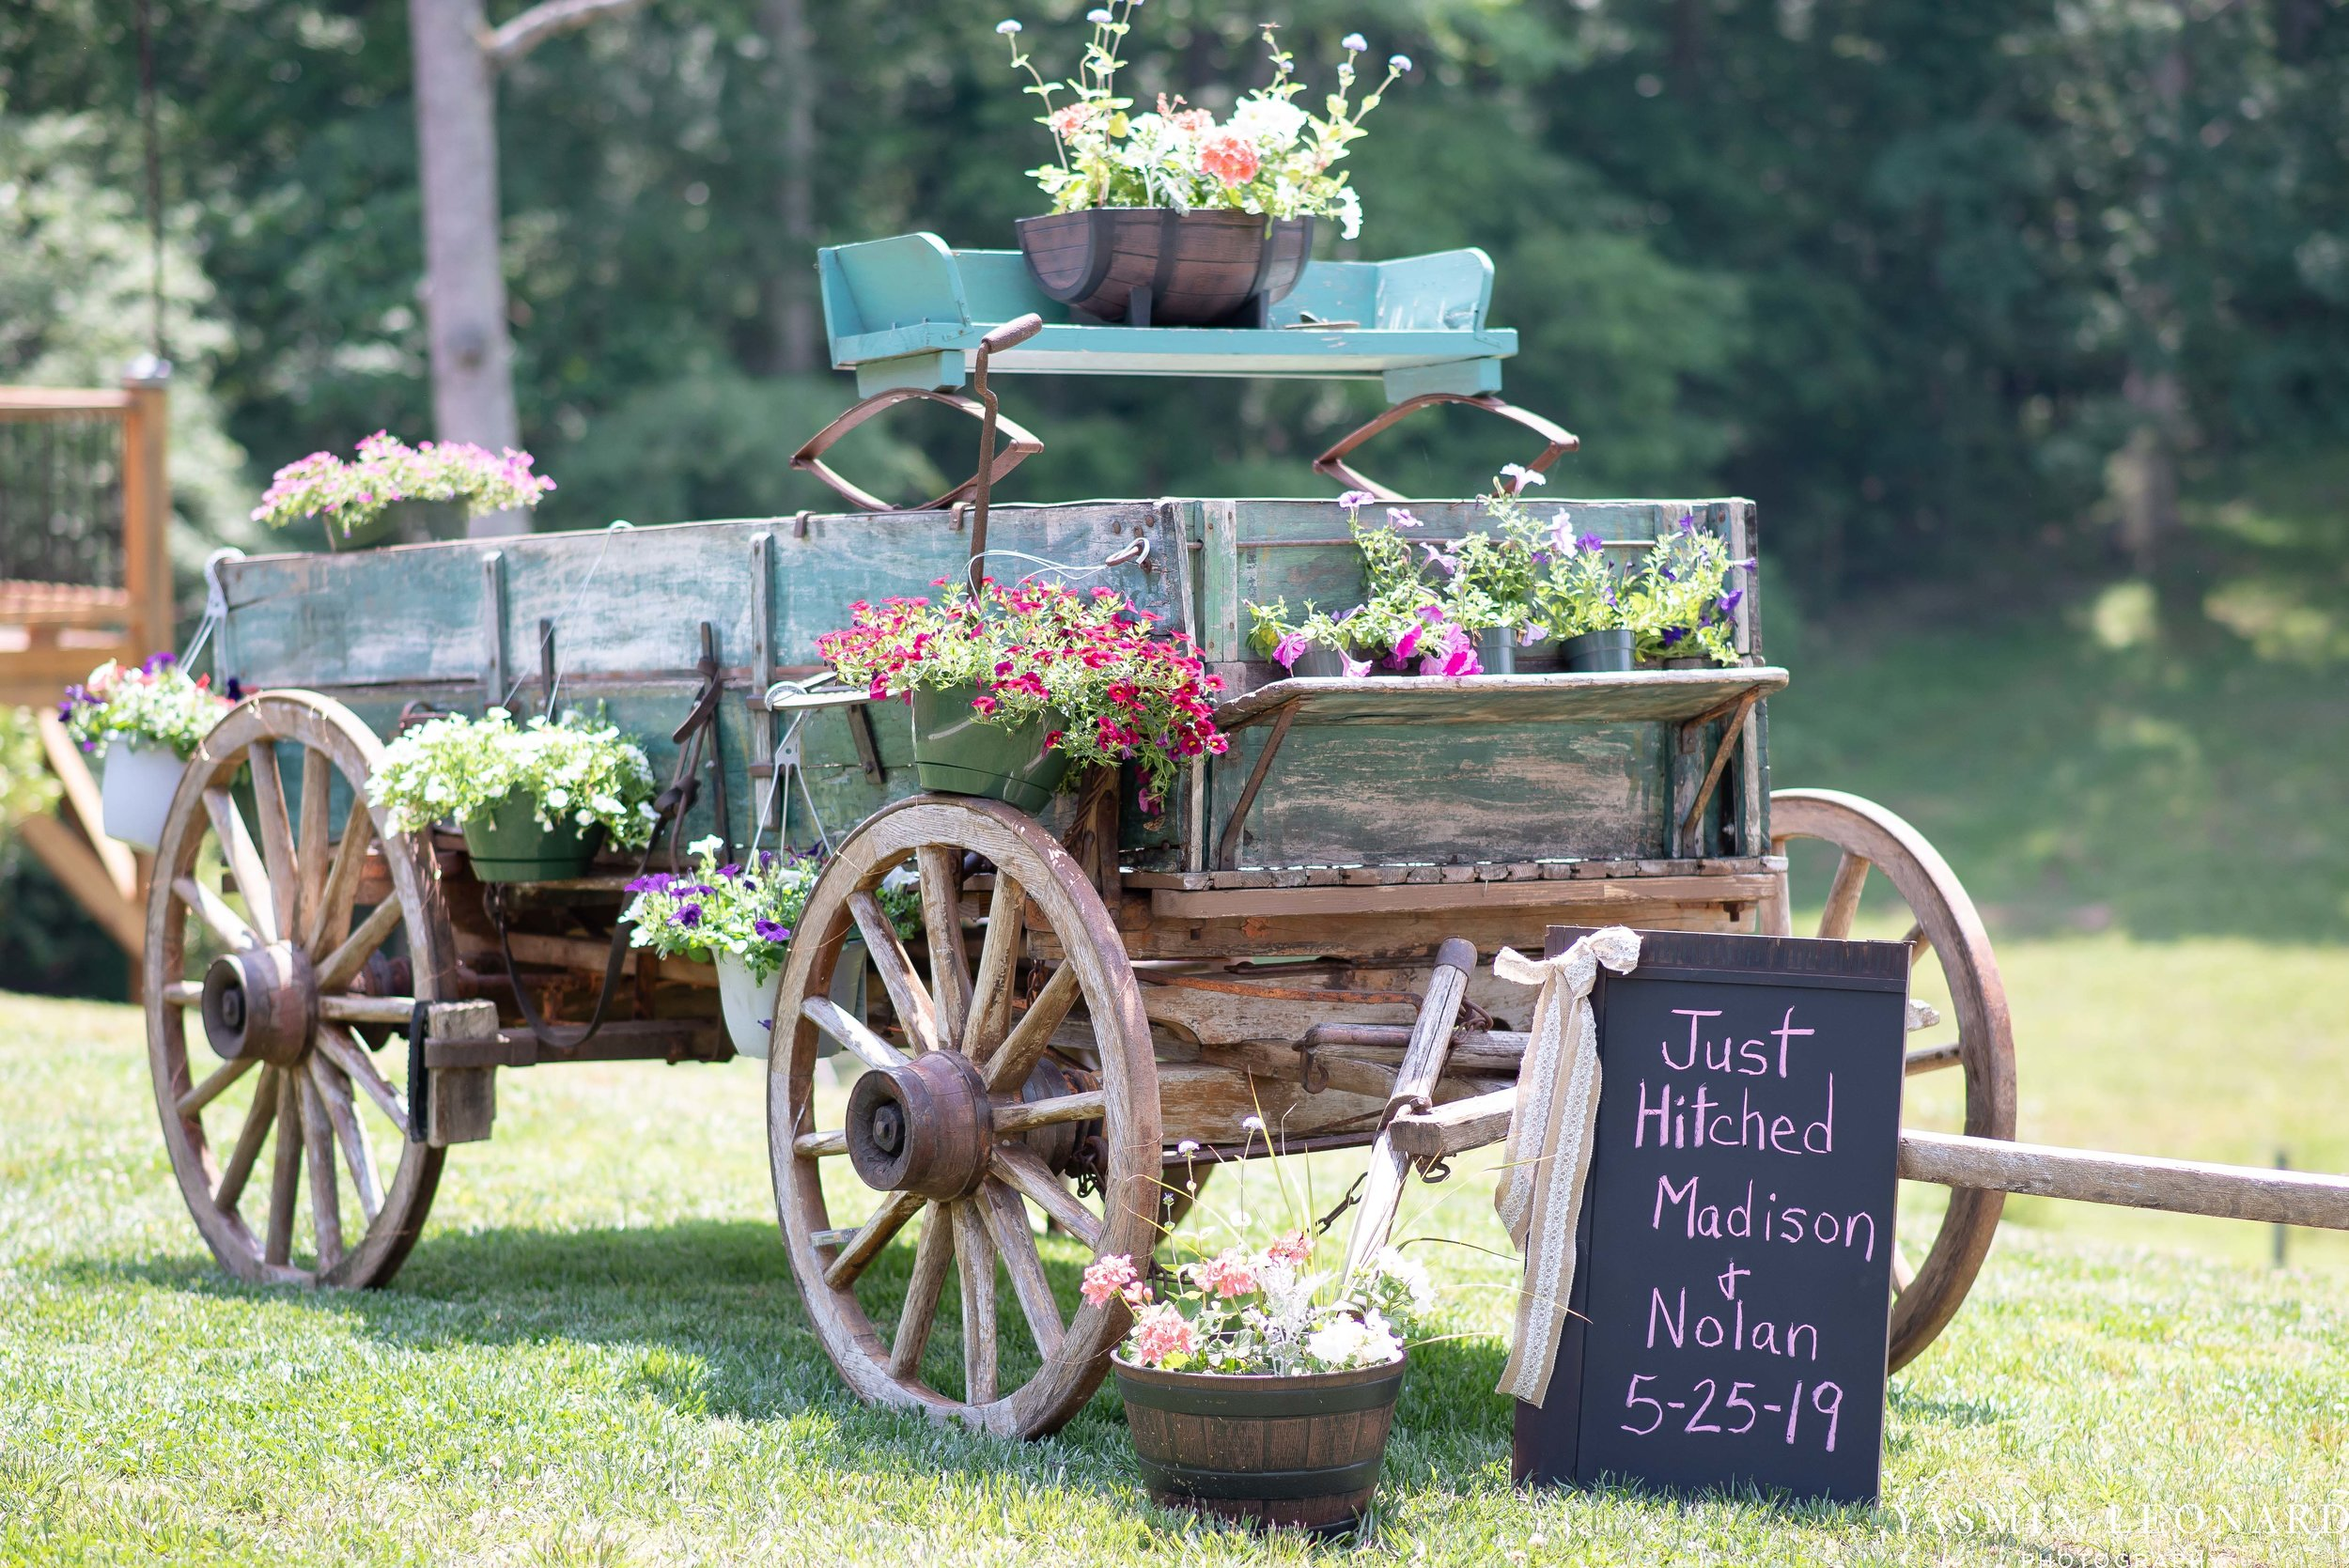 Old Homeplace Vineyard - NC Weddings - Outdoor Summer Weddings - Peony Boutique - Vineyard Wedding - NC Photographer - Yasmin Leonard Photography-2.jpg